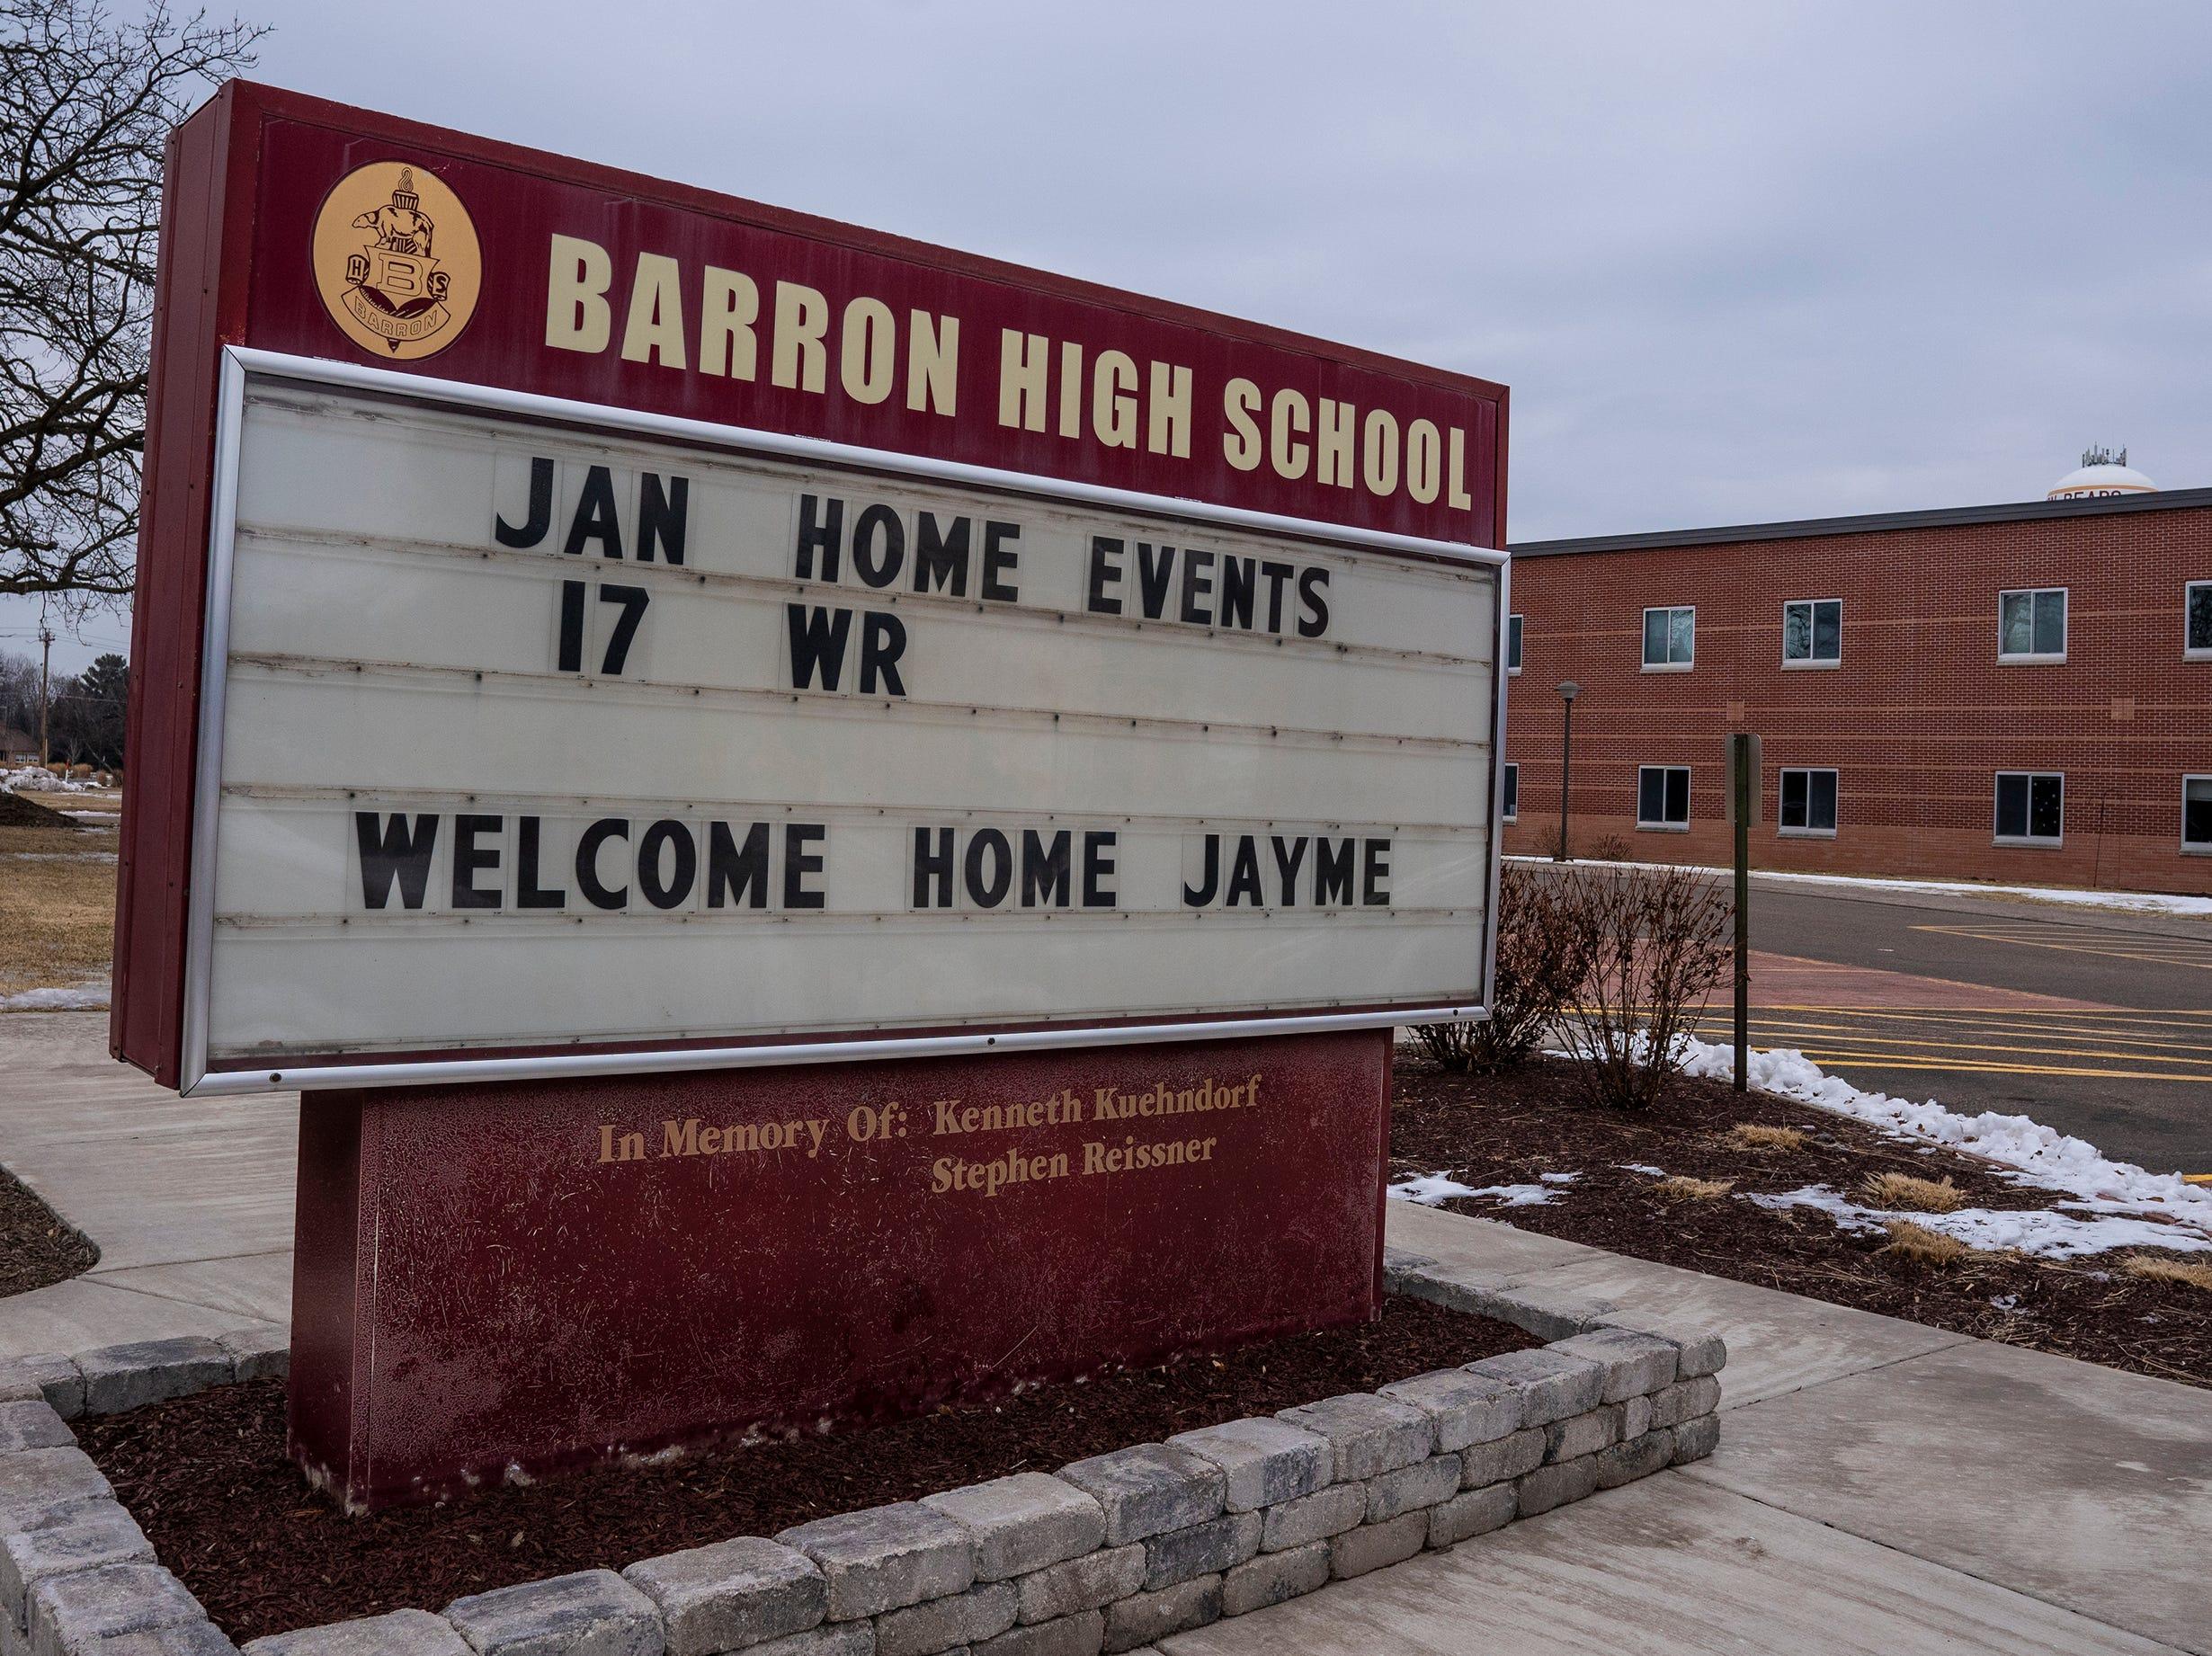 Barron High School's sign.